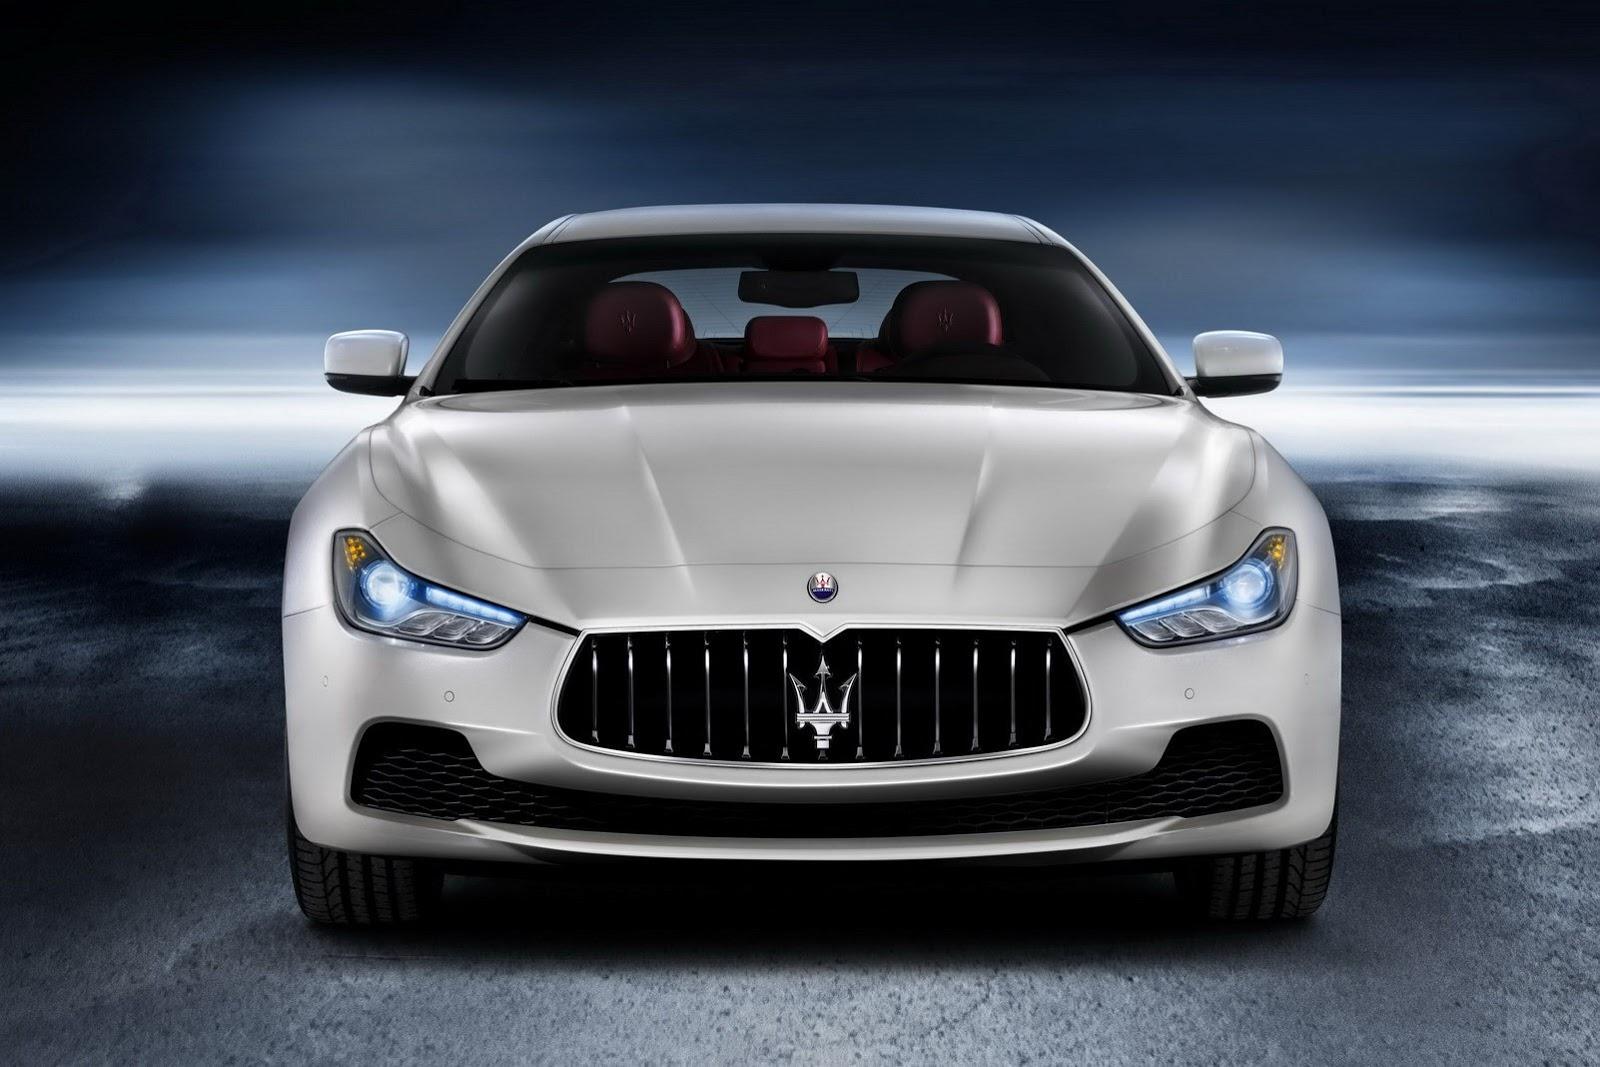 [Image: Maserati-Ghibli-8%25255B2%25255D.jpg]